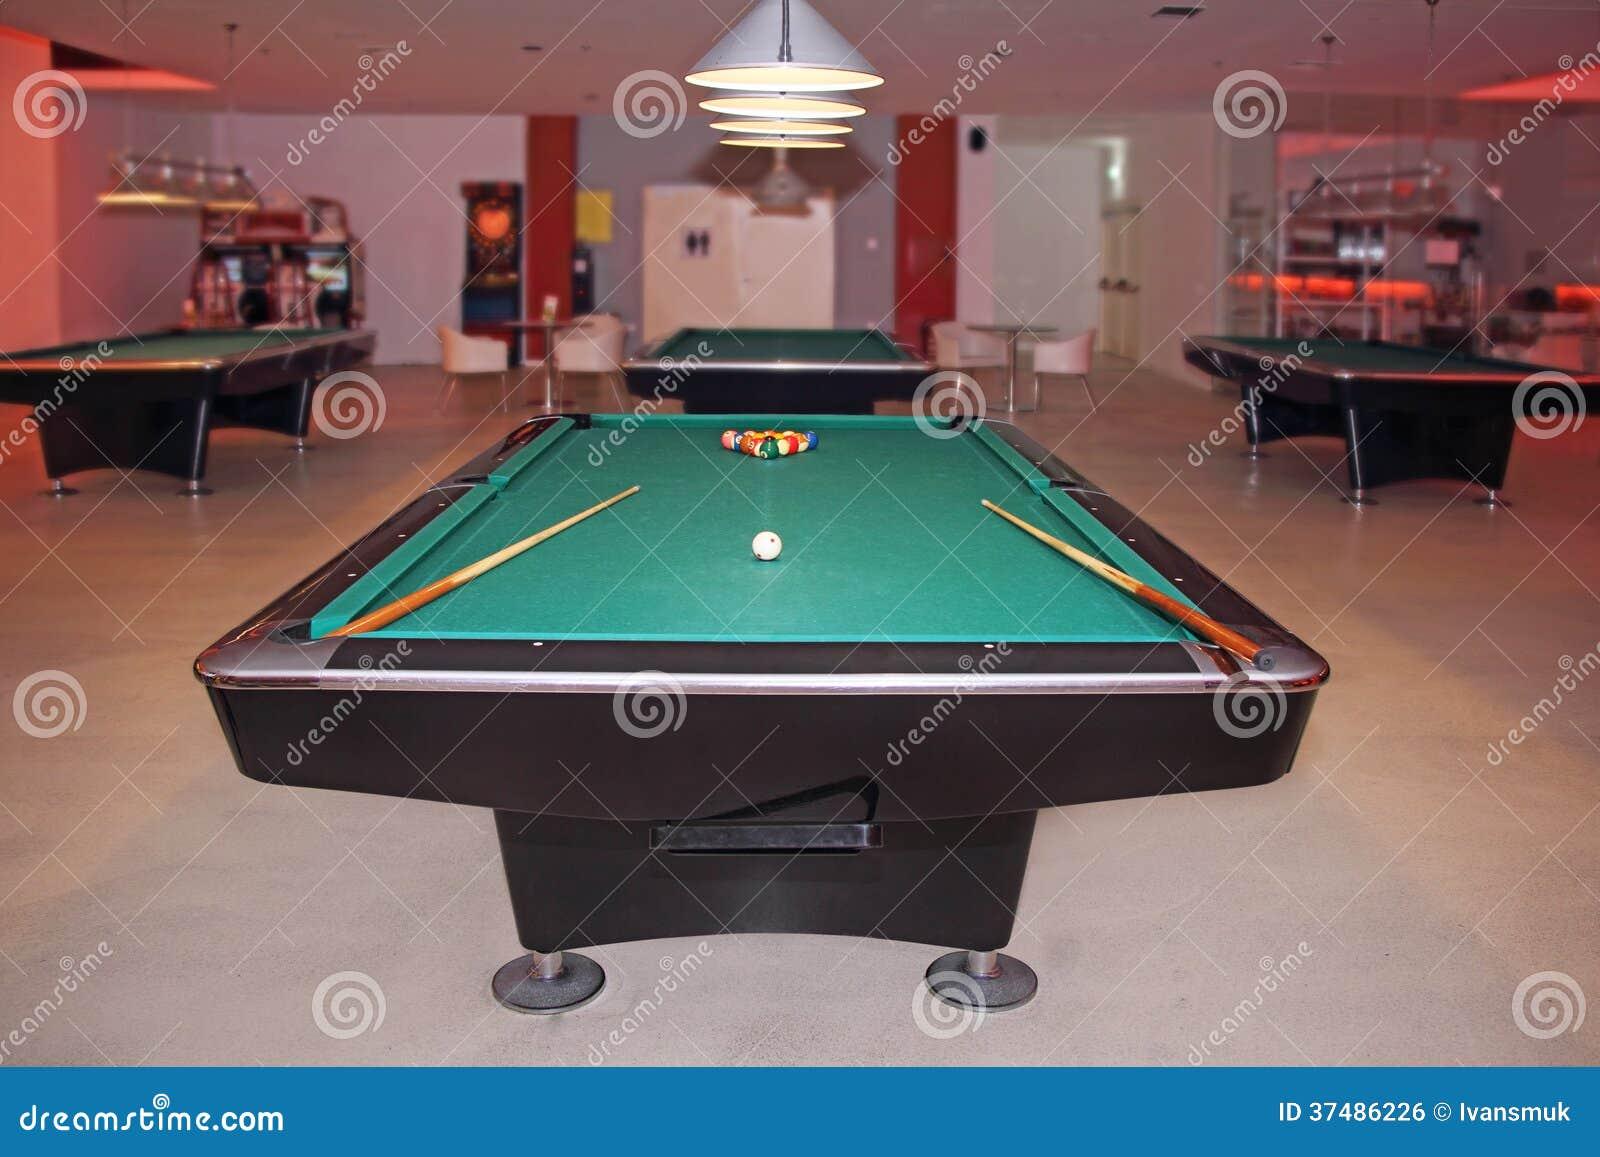 Free pool hall business plan